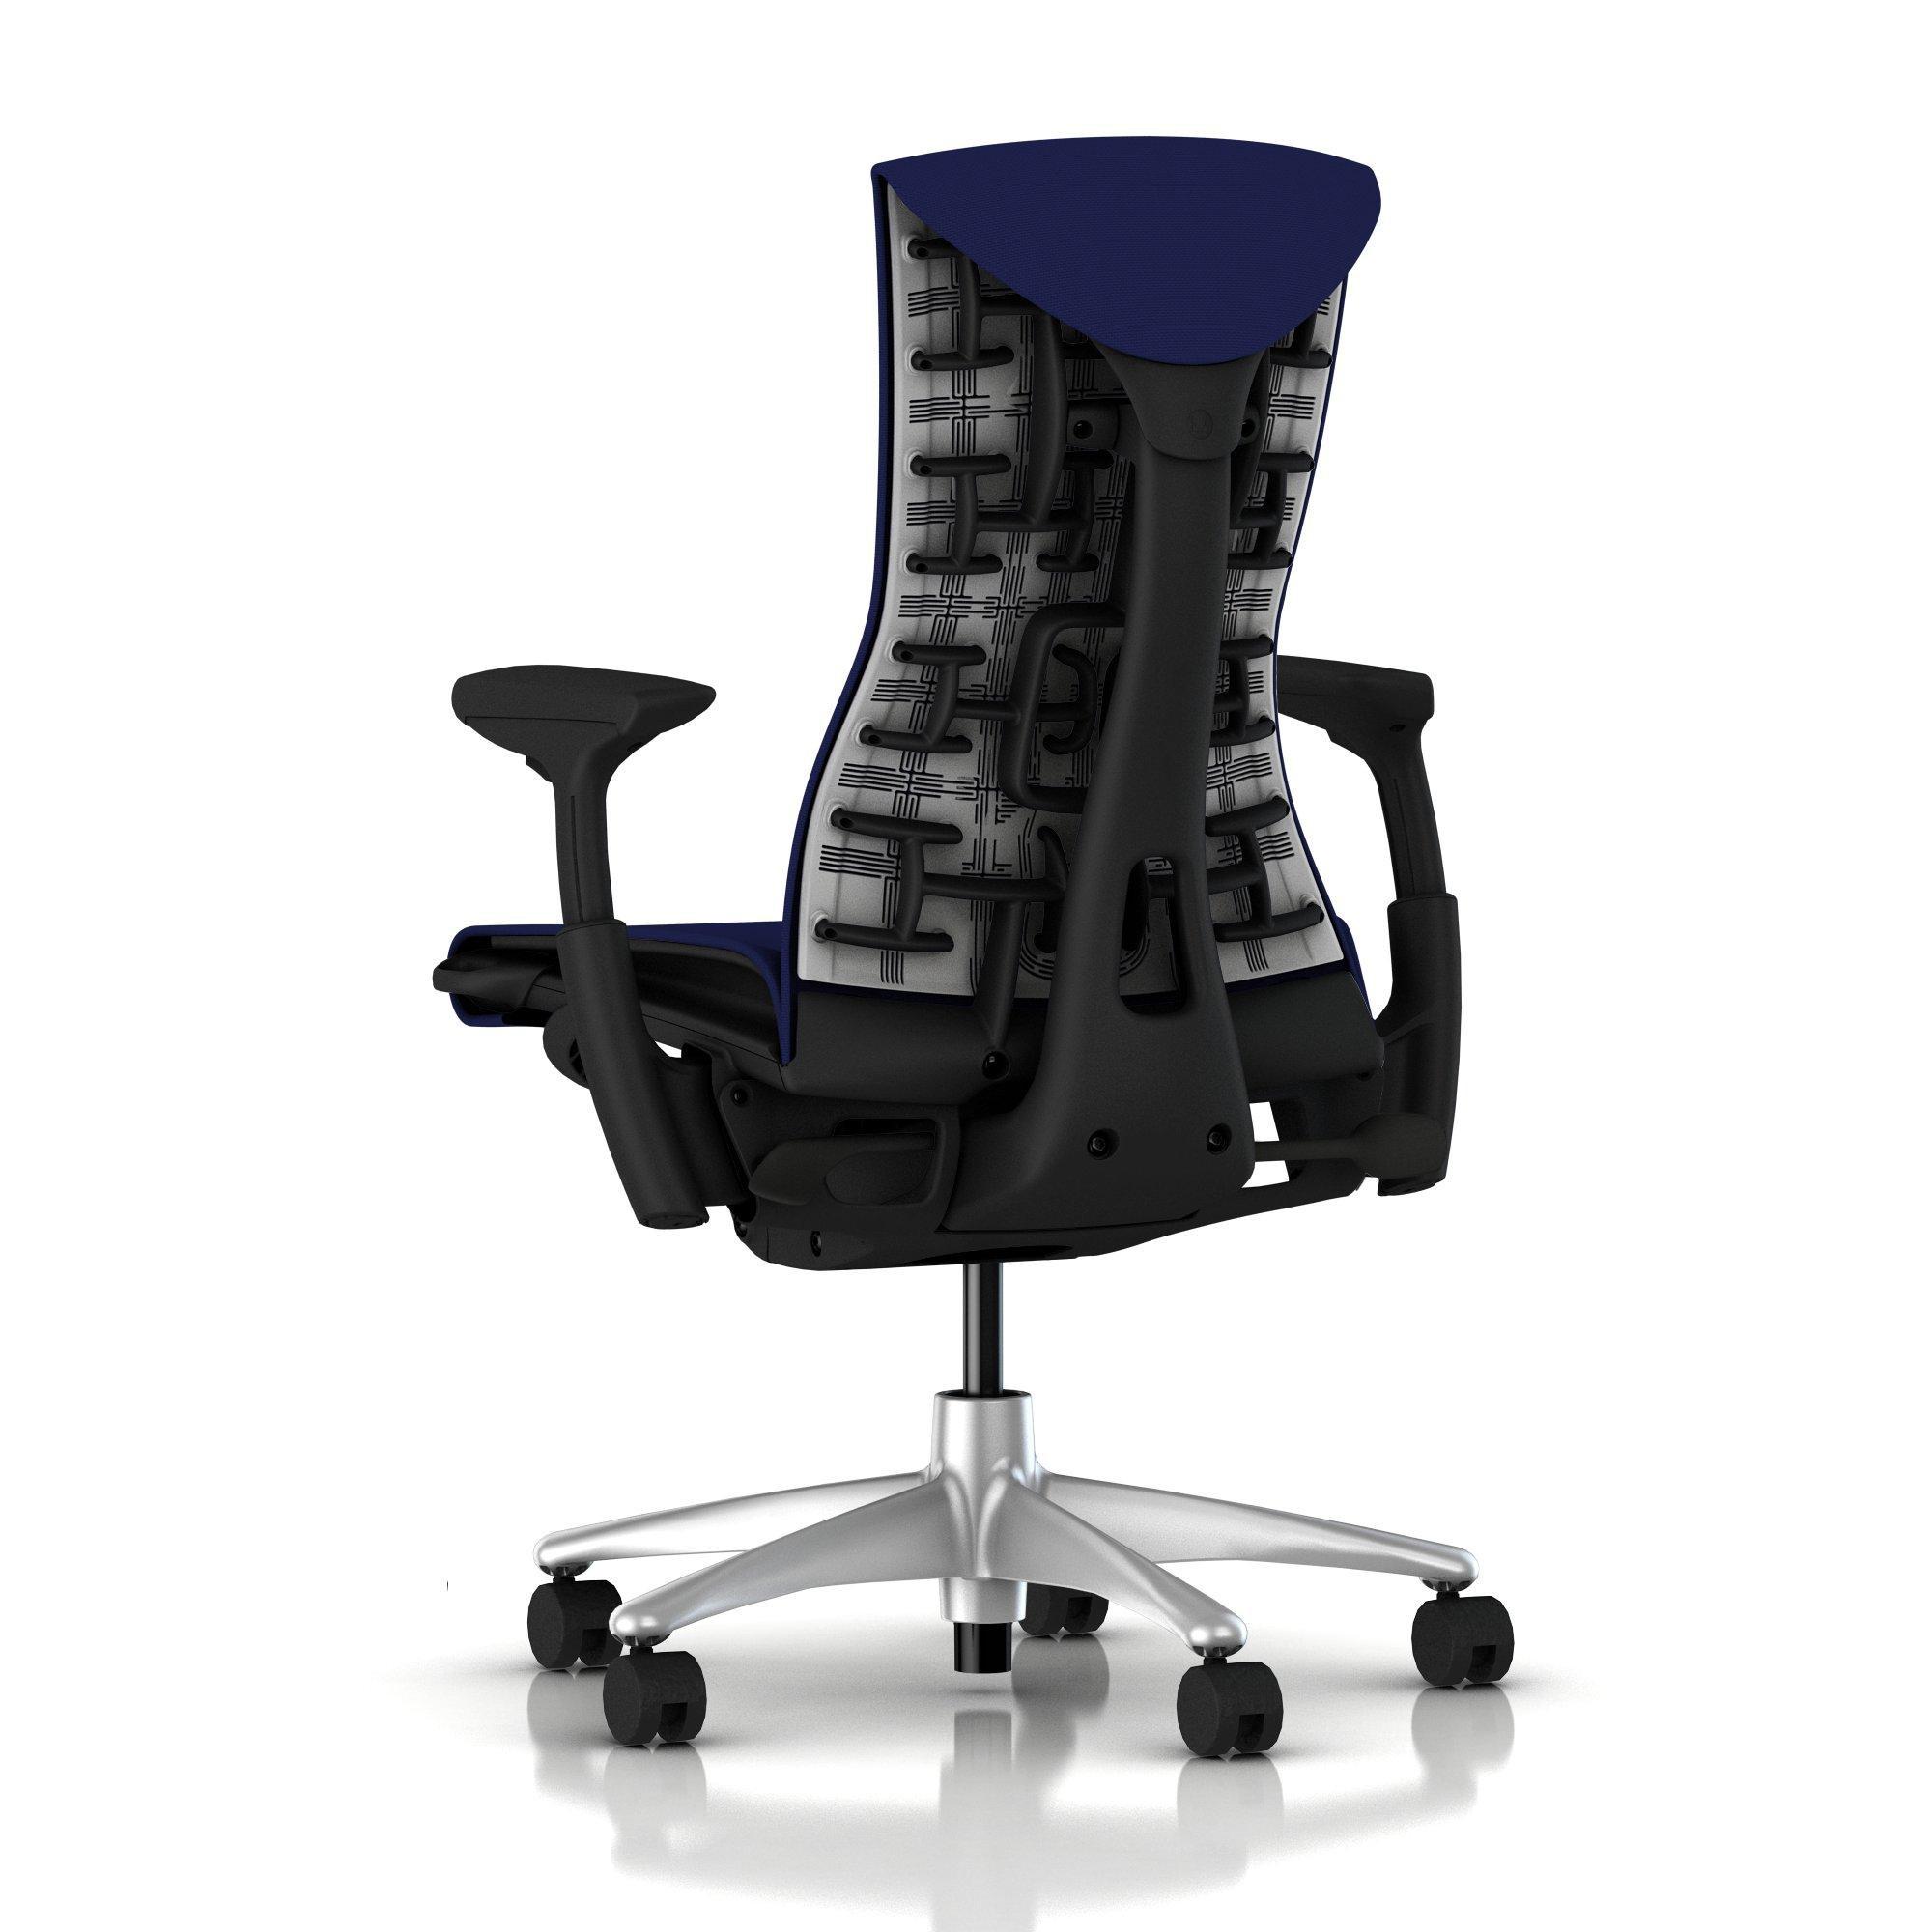 Herman Miller Embody Chair Twilight Blue Rhythm with Graphite